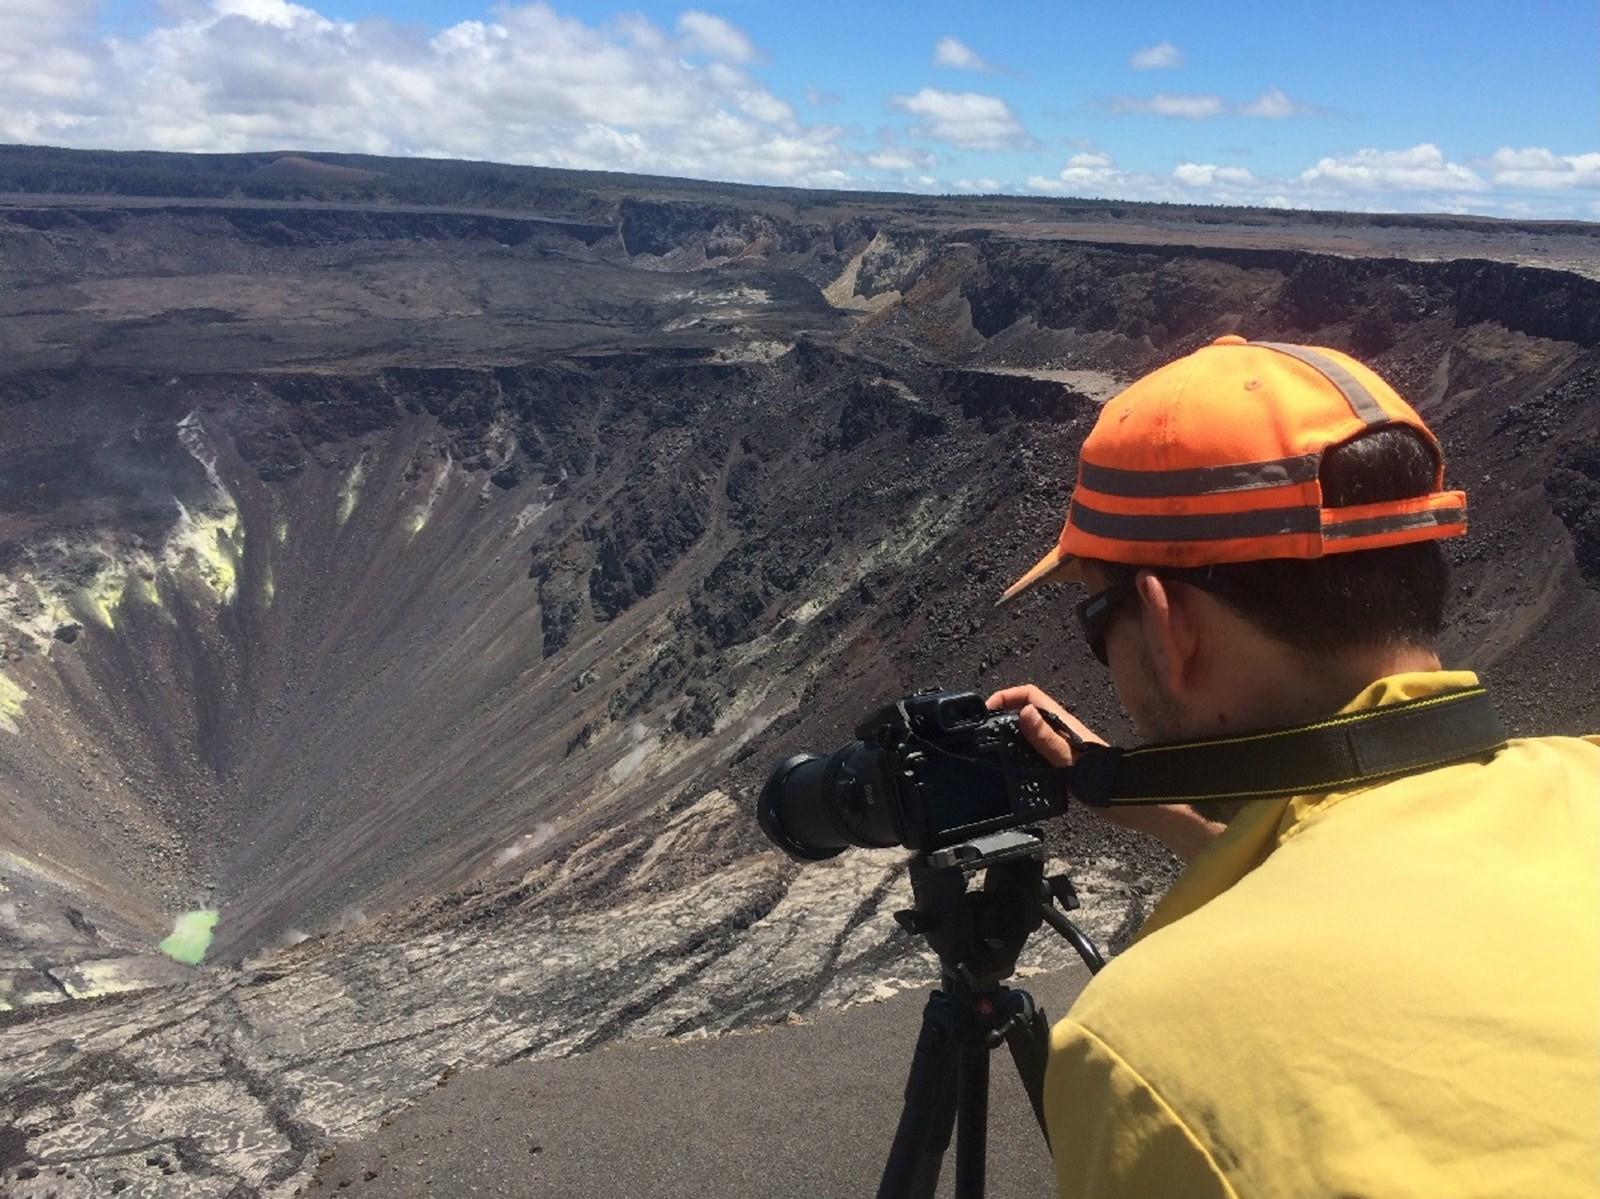 Phänomen: Wachsender Vulkansee versetzt Geologen in Erstaunen – derStandard.at